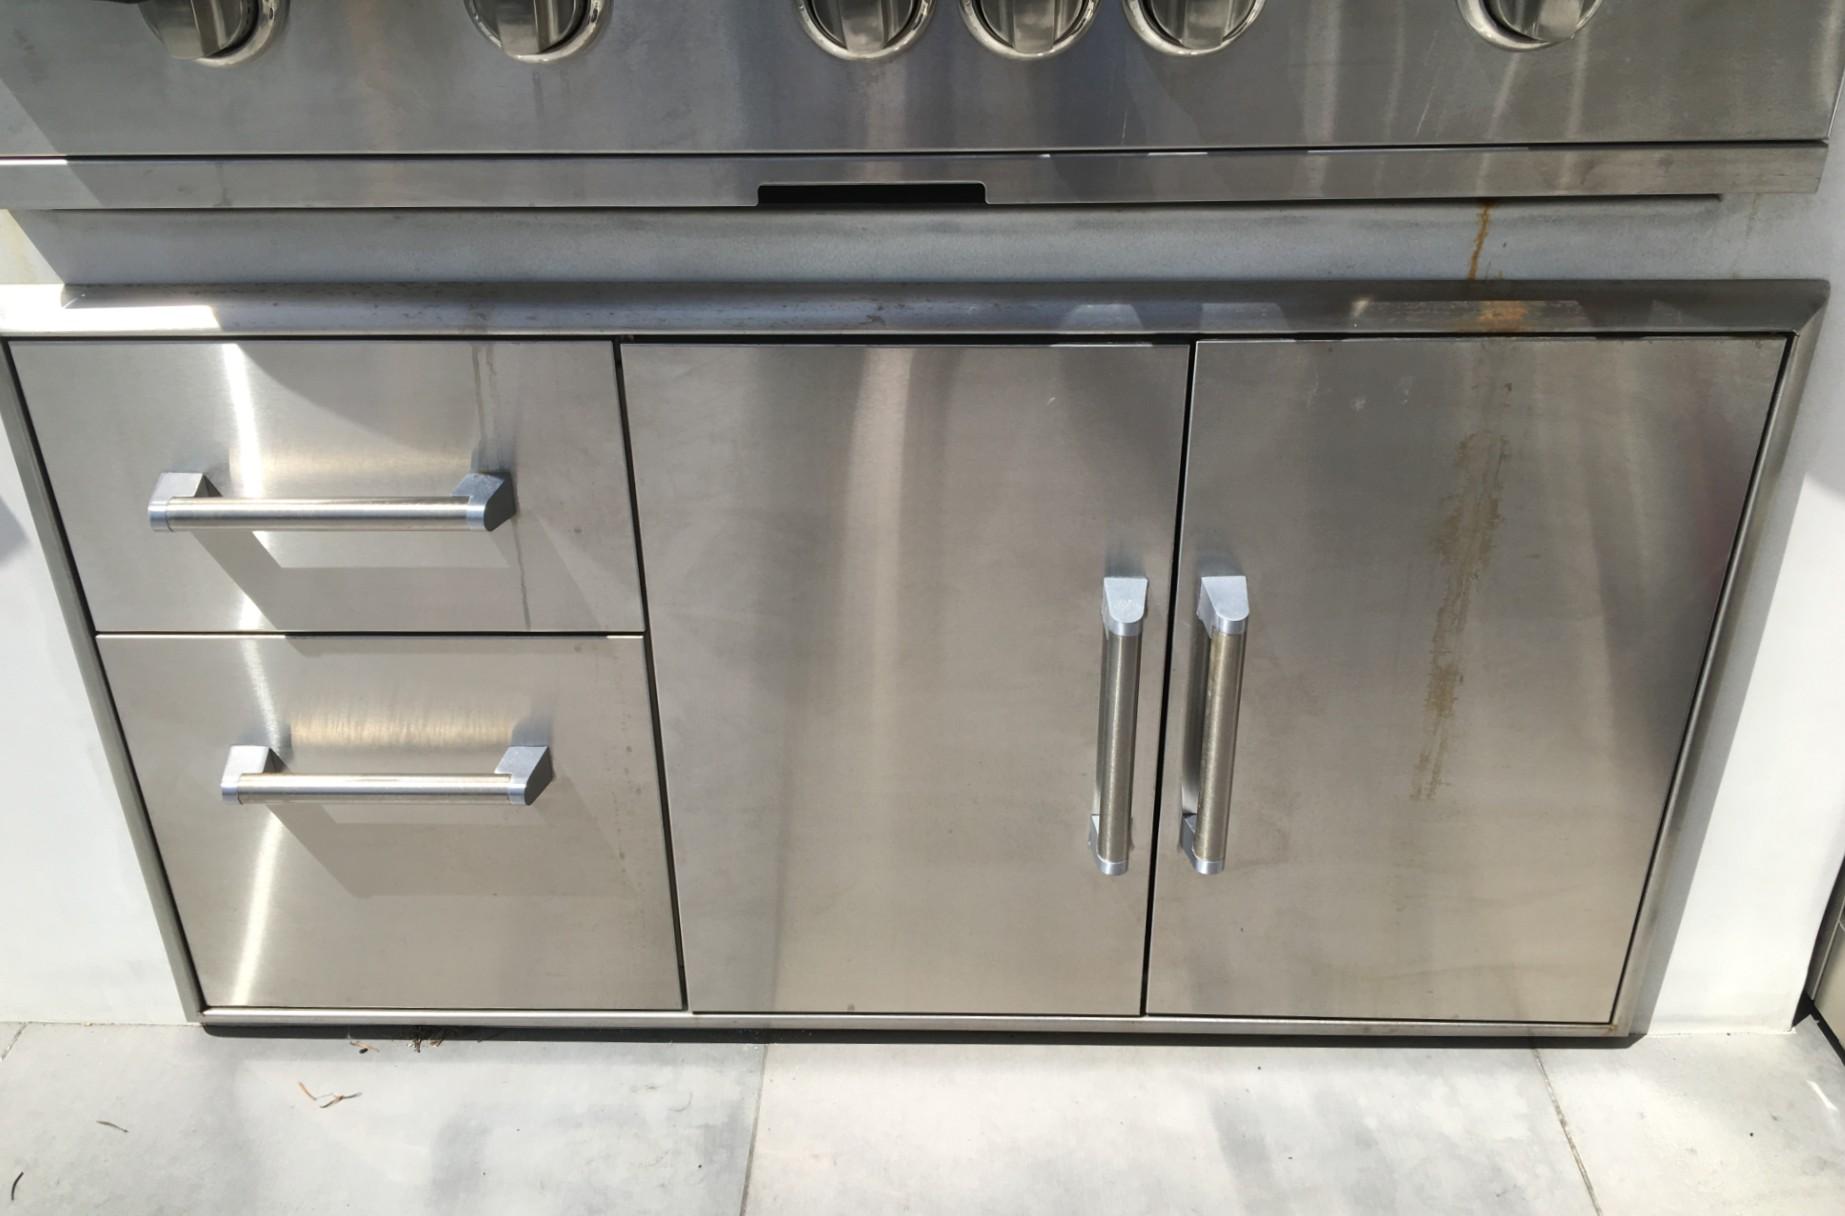 Stainless Steel Appliance Resurfacing Stainless Steel